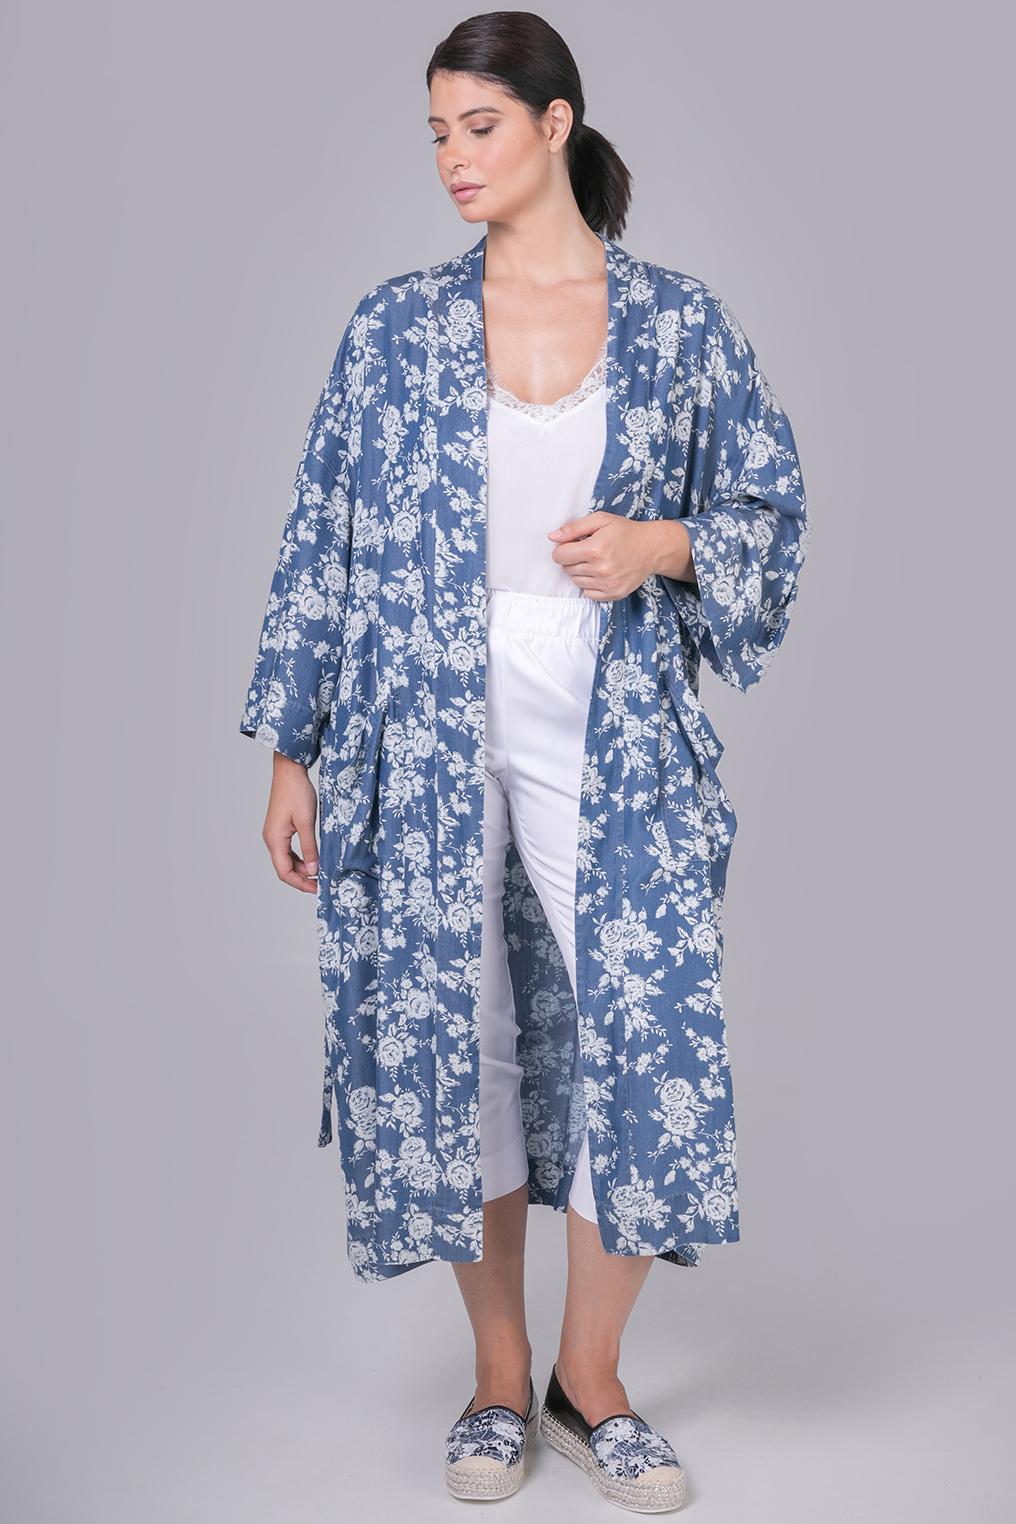 Jas Mat kimonolook denim gebloemd